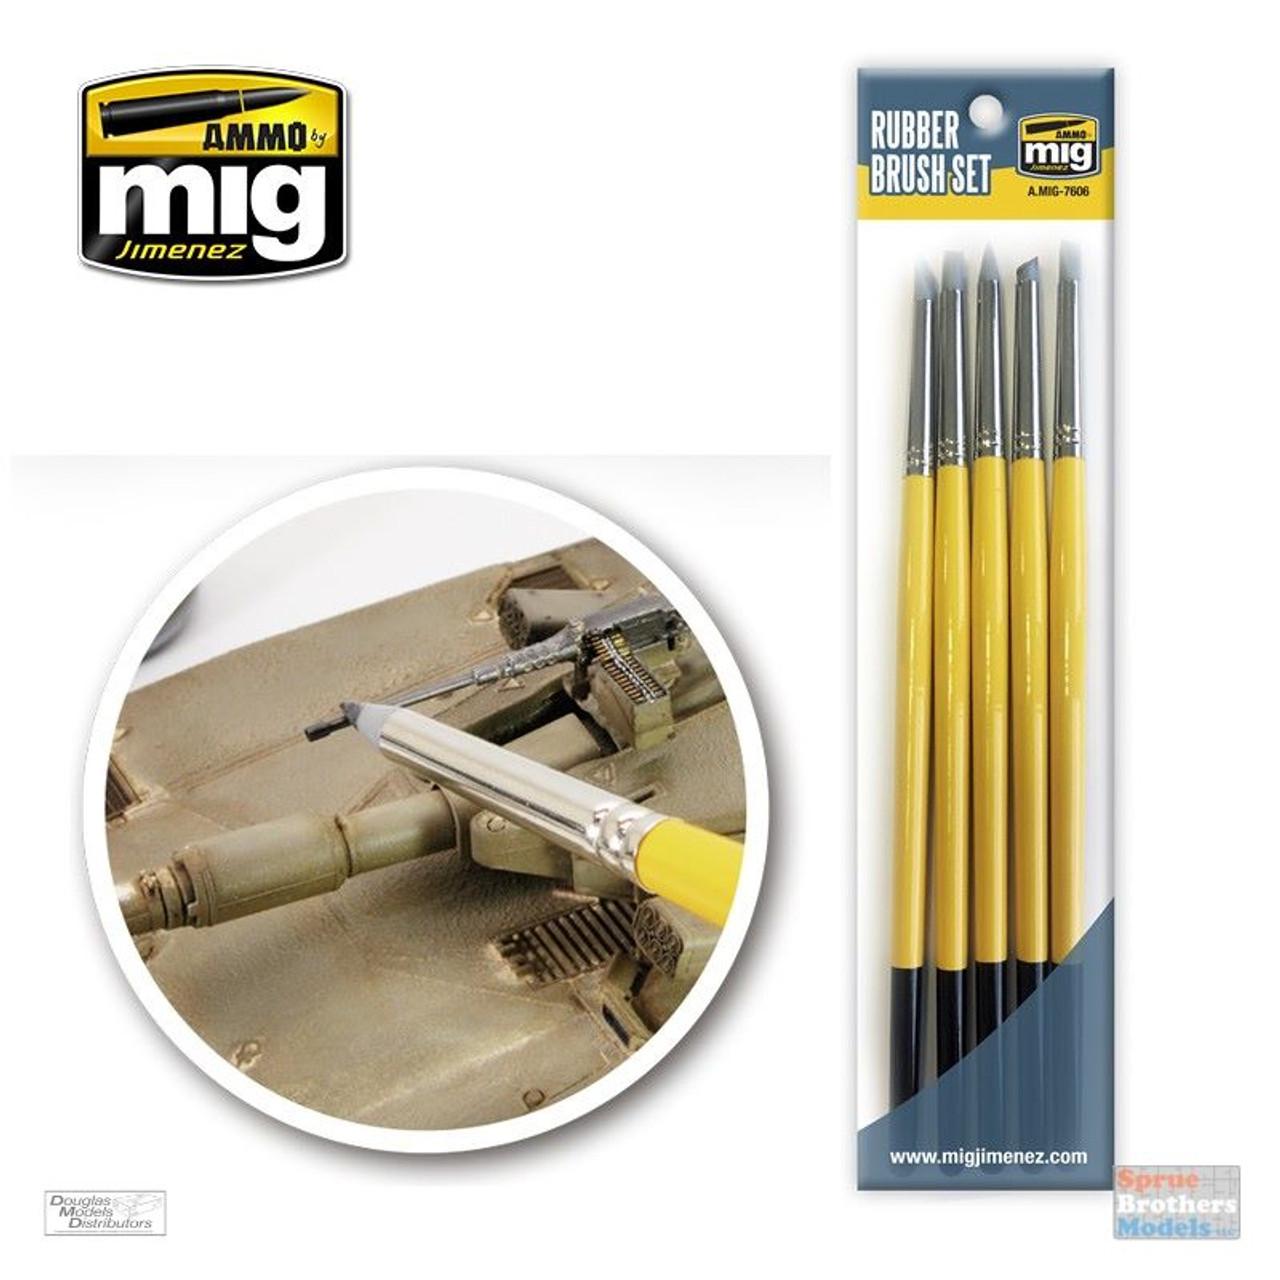 AMM7606 AMMO by Mig - Rubber Brush Set